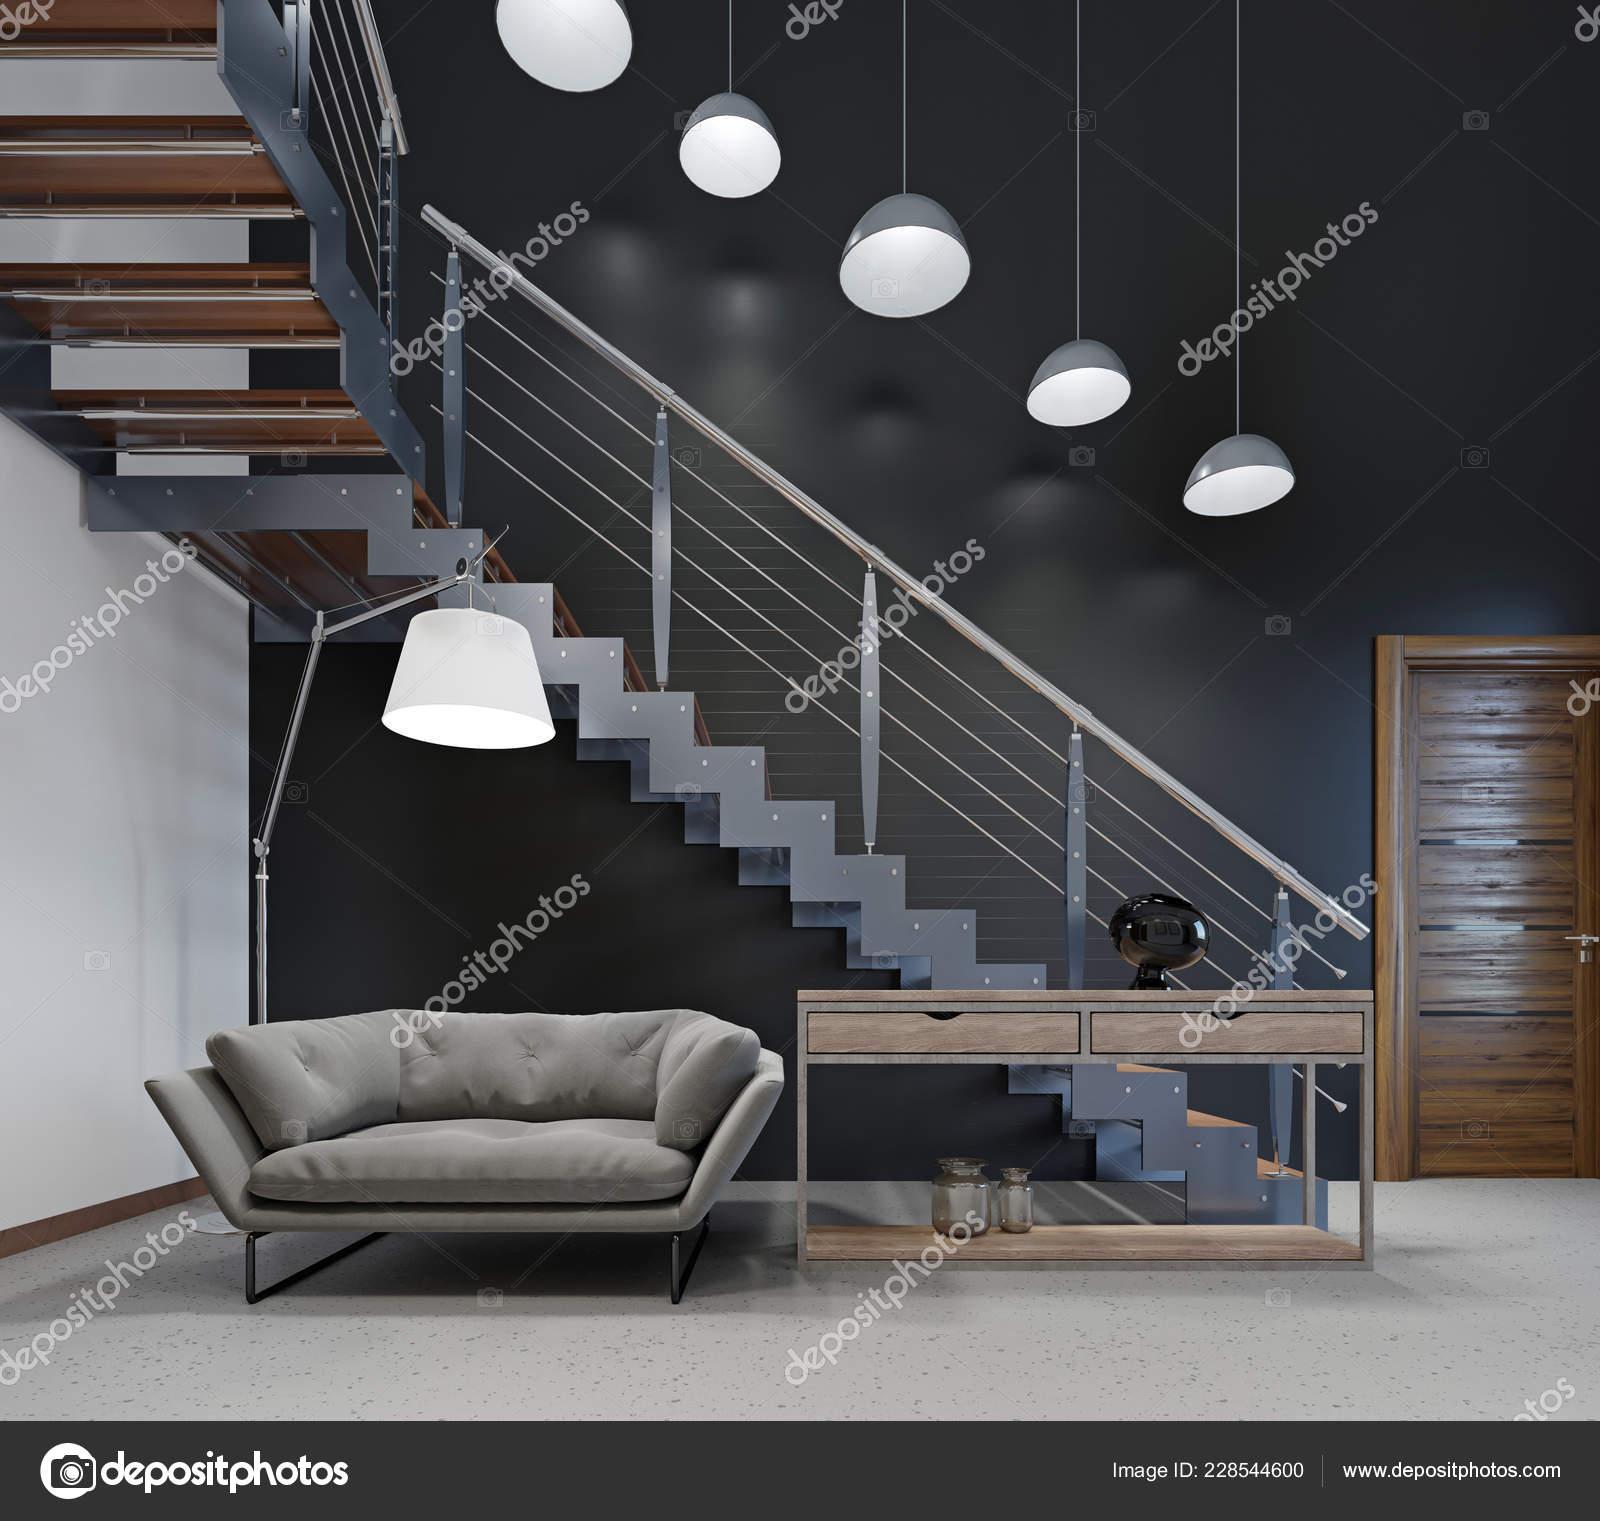 Comfortable Modern Sofa Lobby Stairs Second Floor Rendering Stock